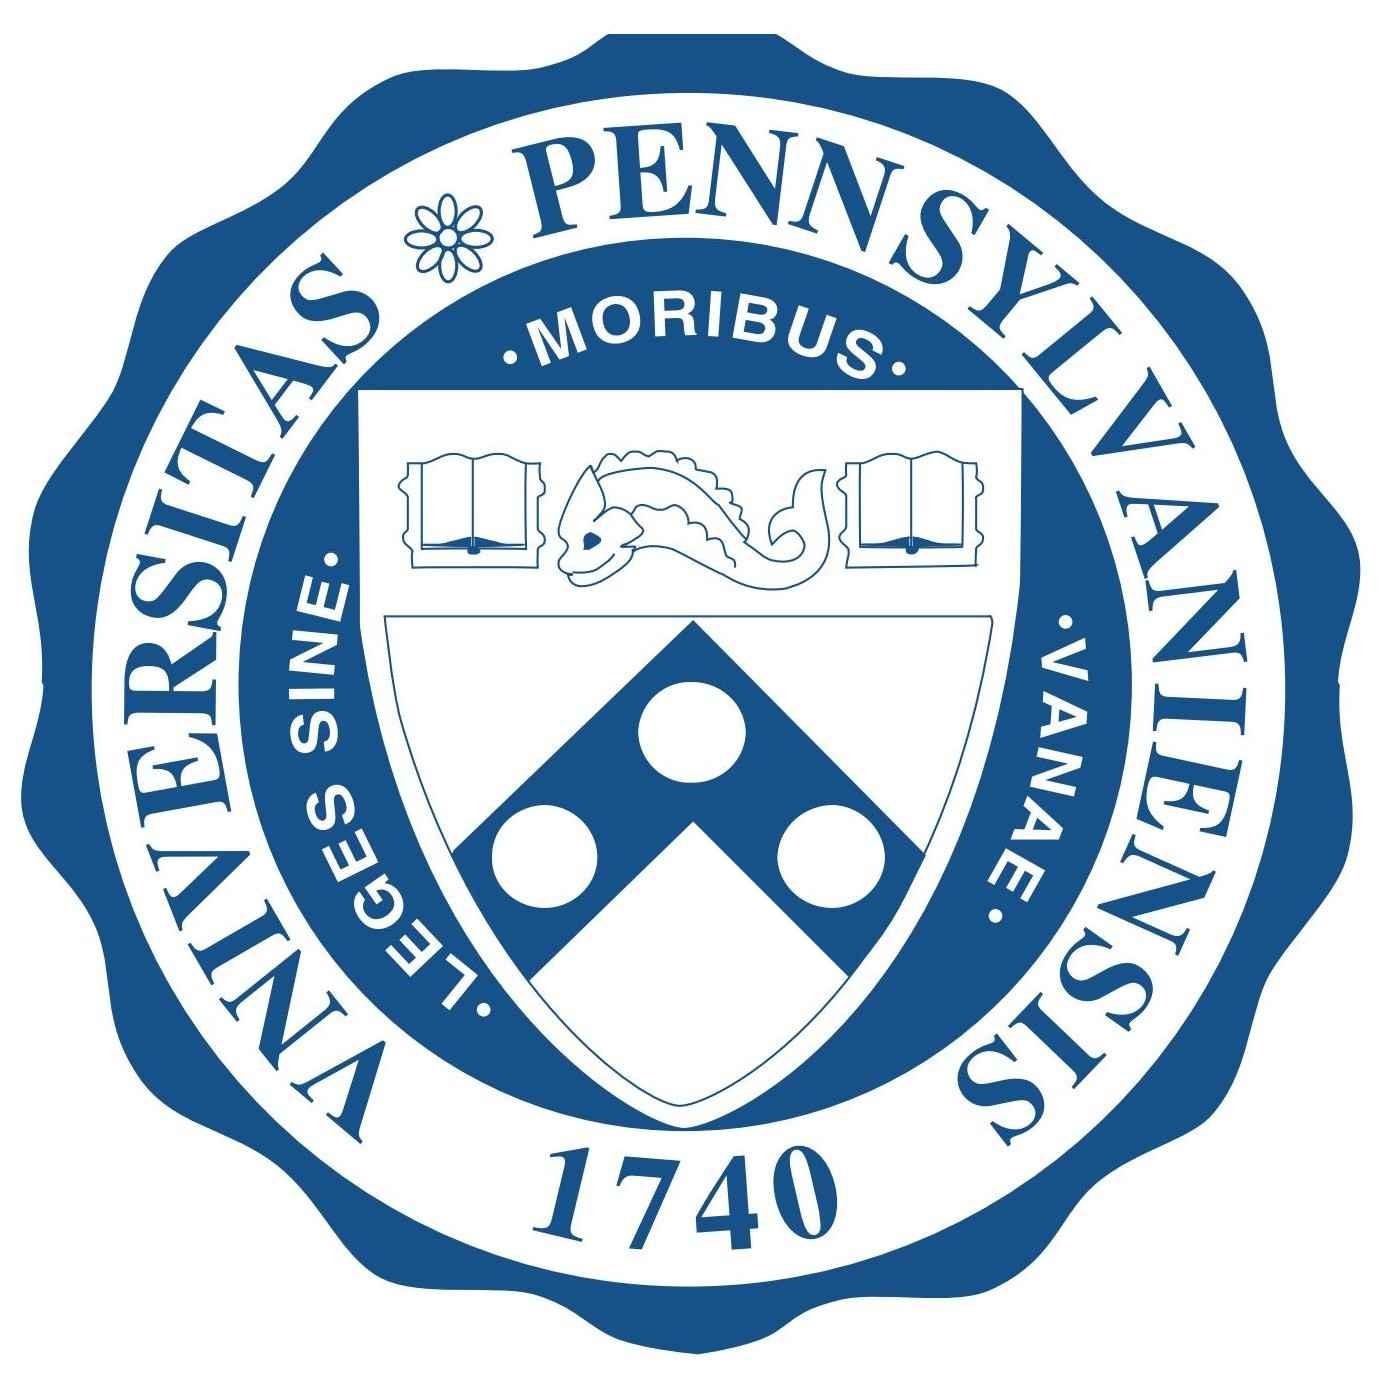 Penn_Logo_University_of_Pennsylvania - Coat of Arms1